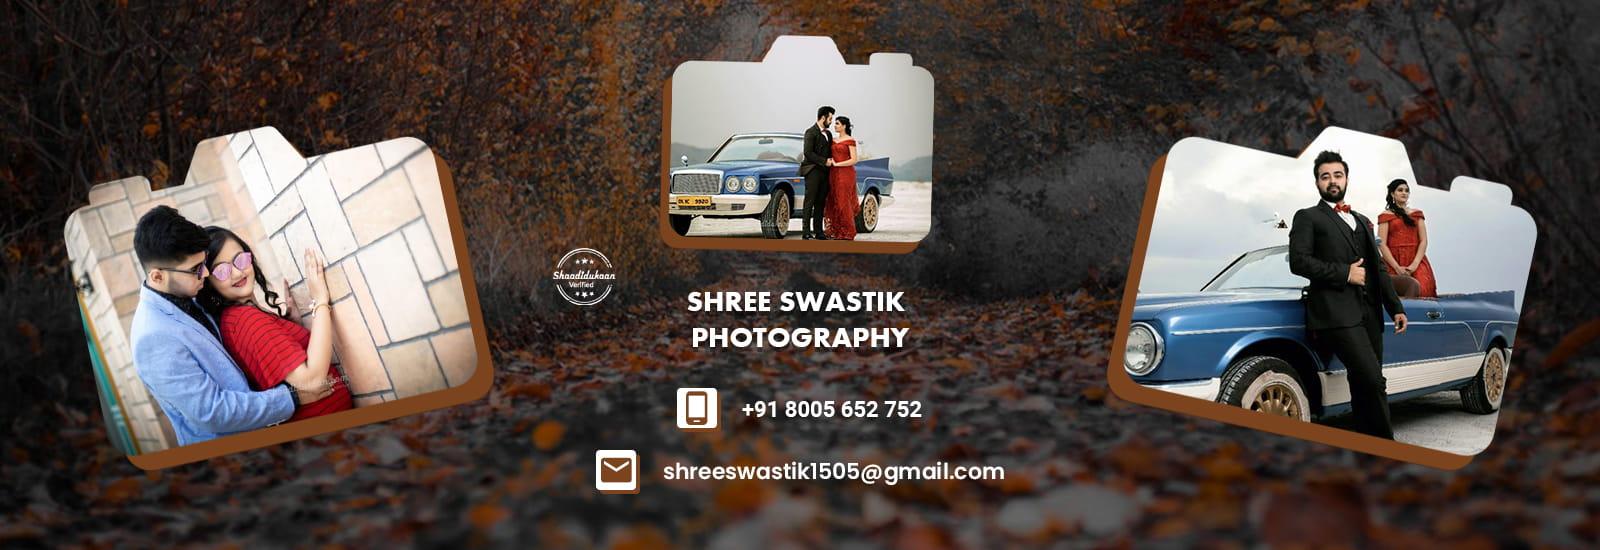 shree-swastik-photography